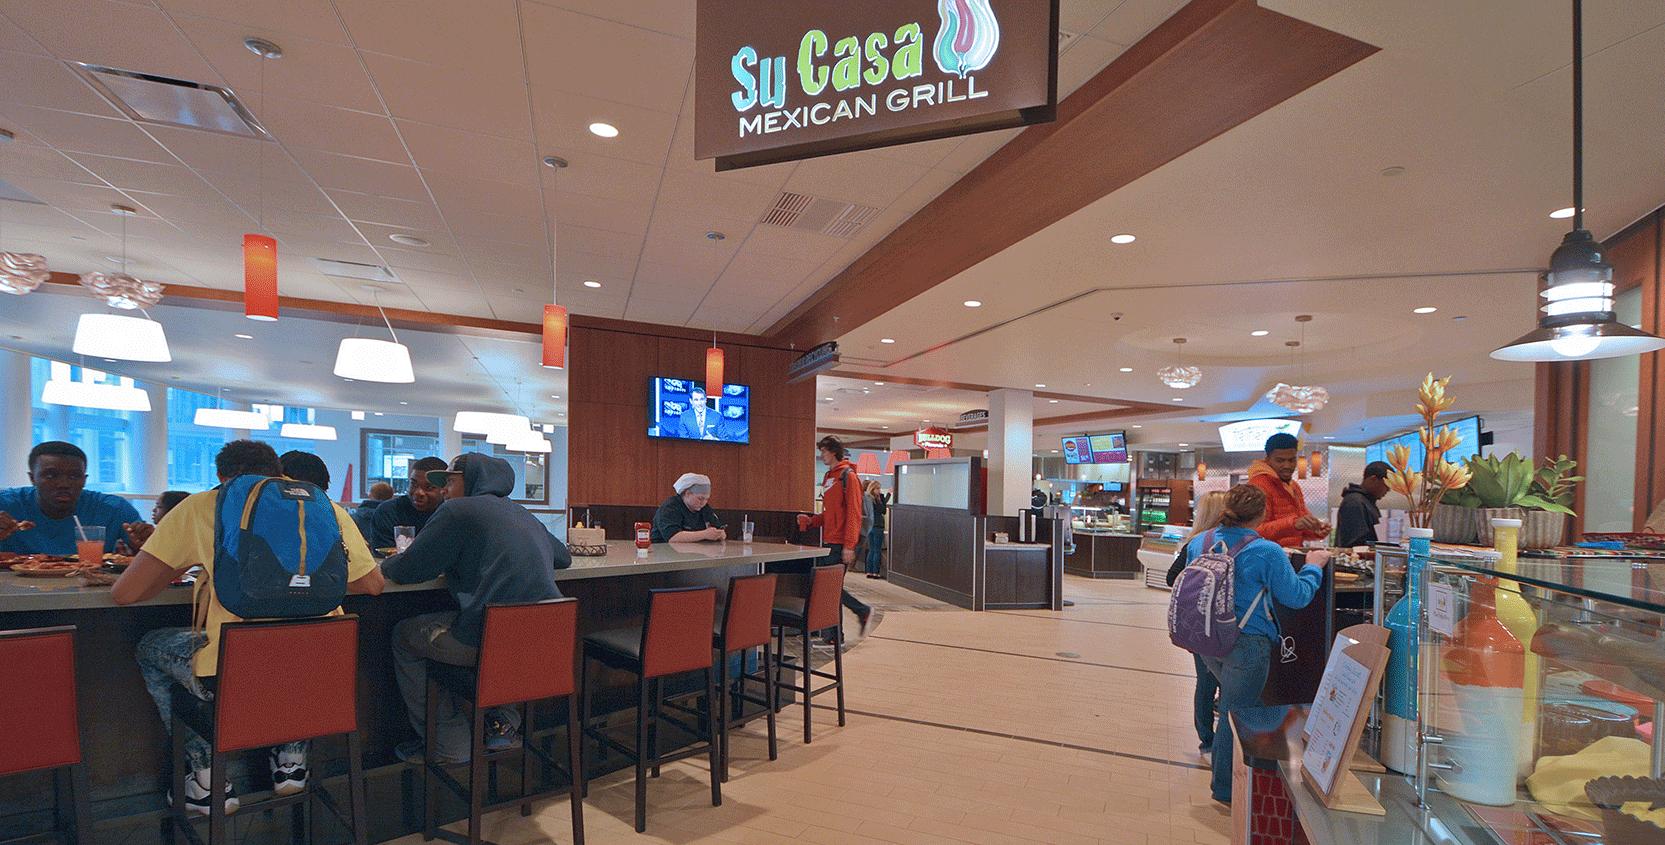 Ferris-State-University-University-Center-Su-Casa-Mexican-Grill-1665x845